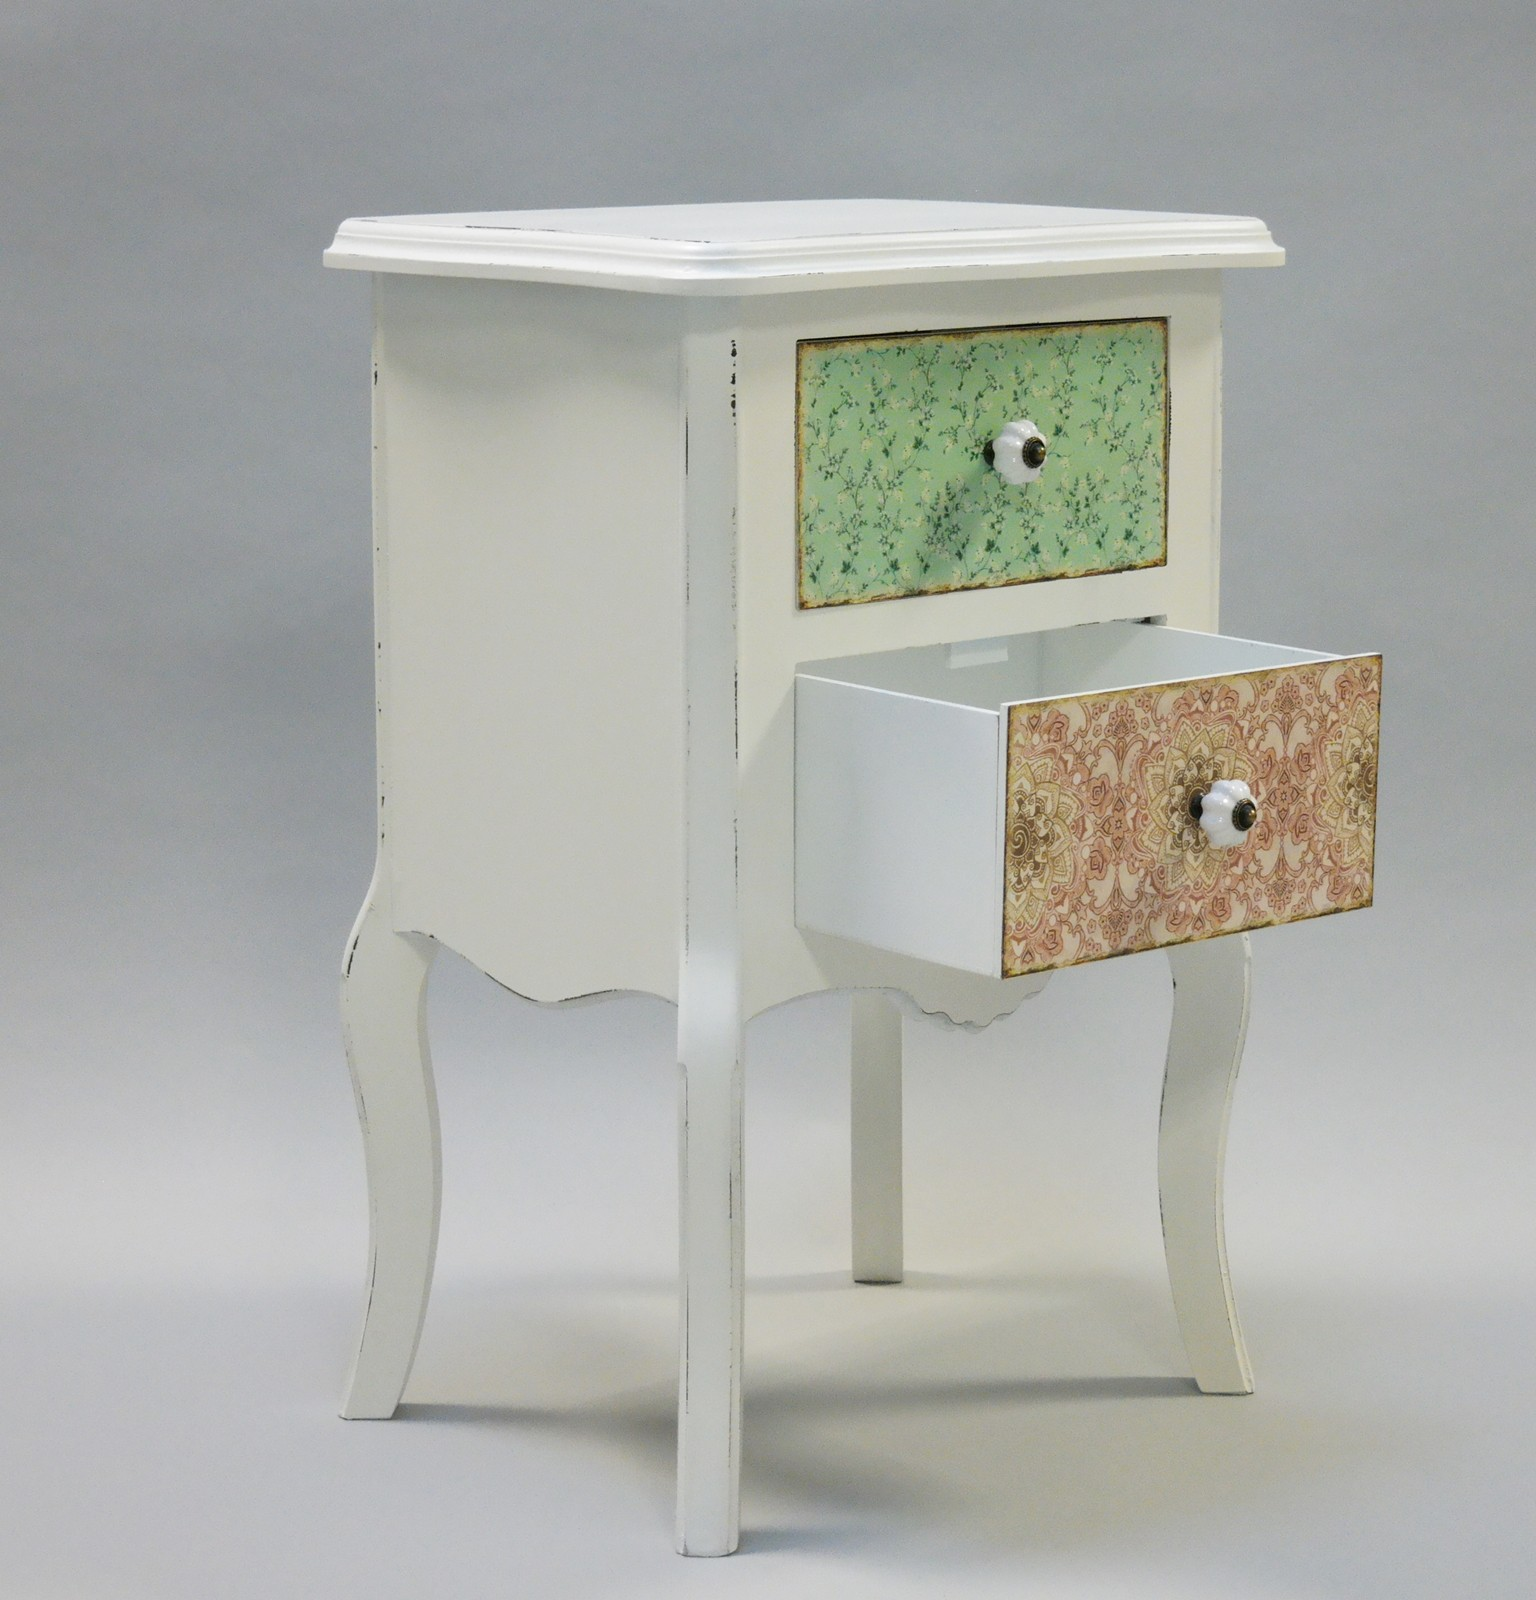 nachtschrank bunt wei paisley. Black Bedroom Furniture Sets. Home Design Ideas